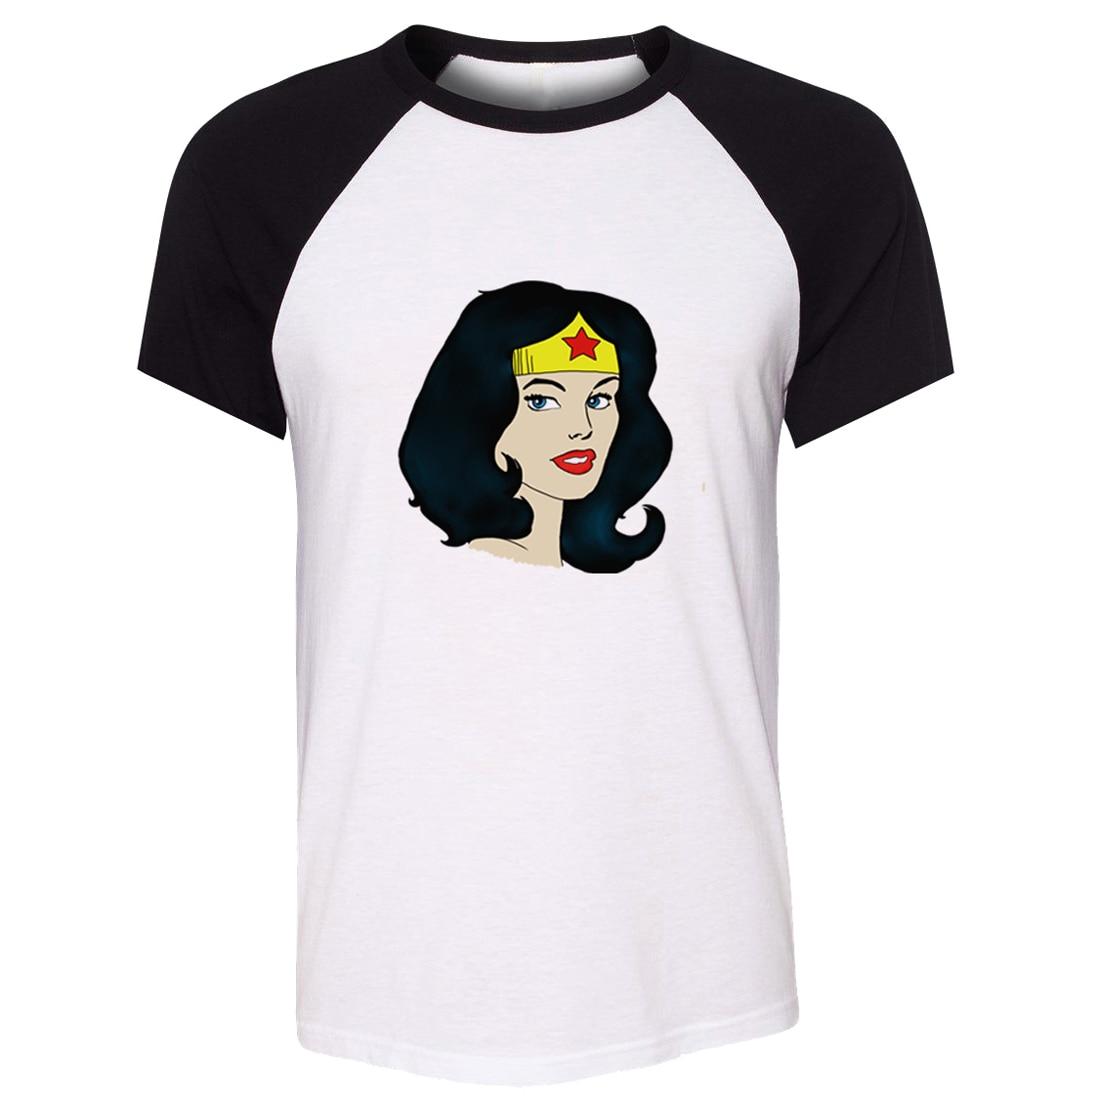 1706277bde8af US $10.06 47% OFF iDzn Unisex Summer T shirt DC Diana Prince Wonder Woman  Stars Head portrait Art Pattern Short Sleeve Men T shirt Casual Tee Tops-in  ...